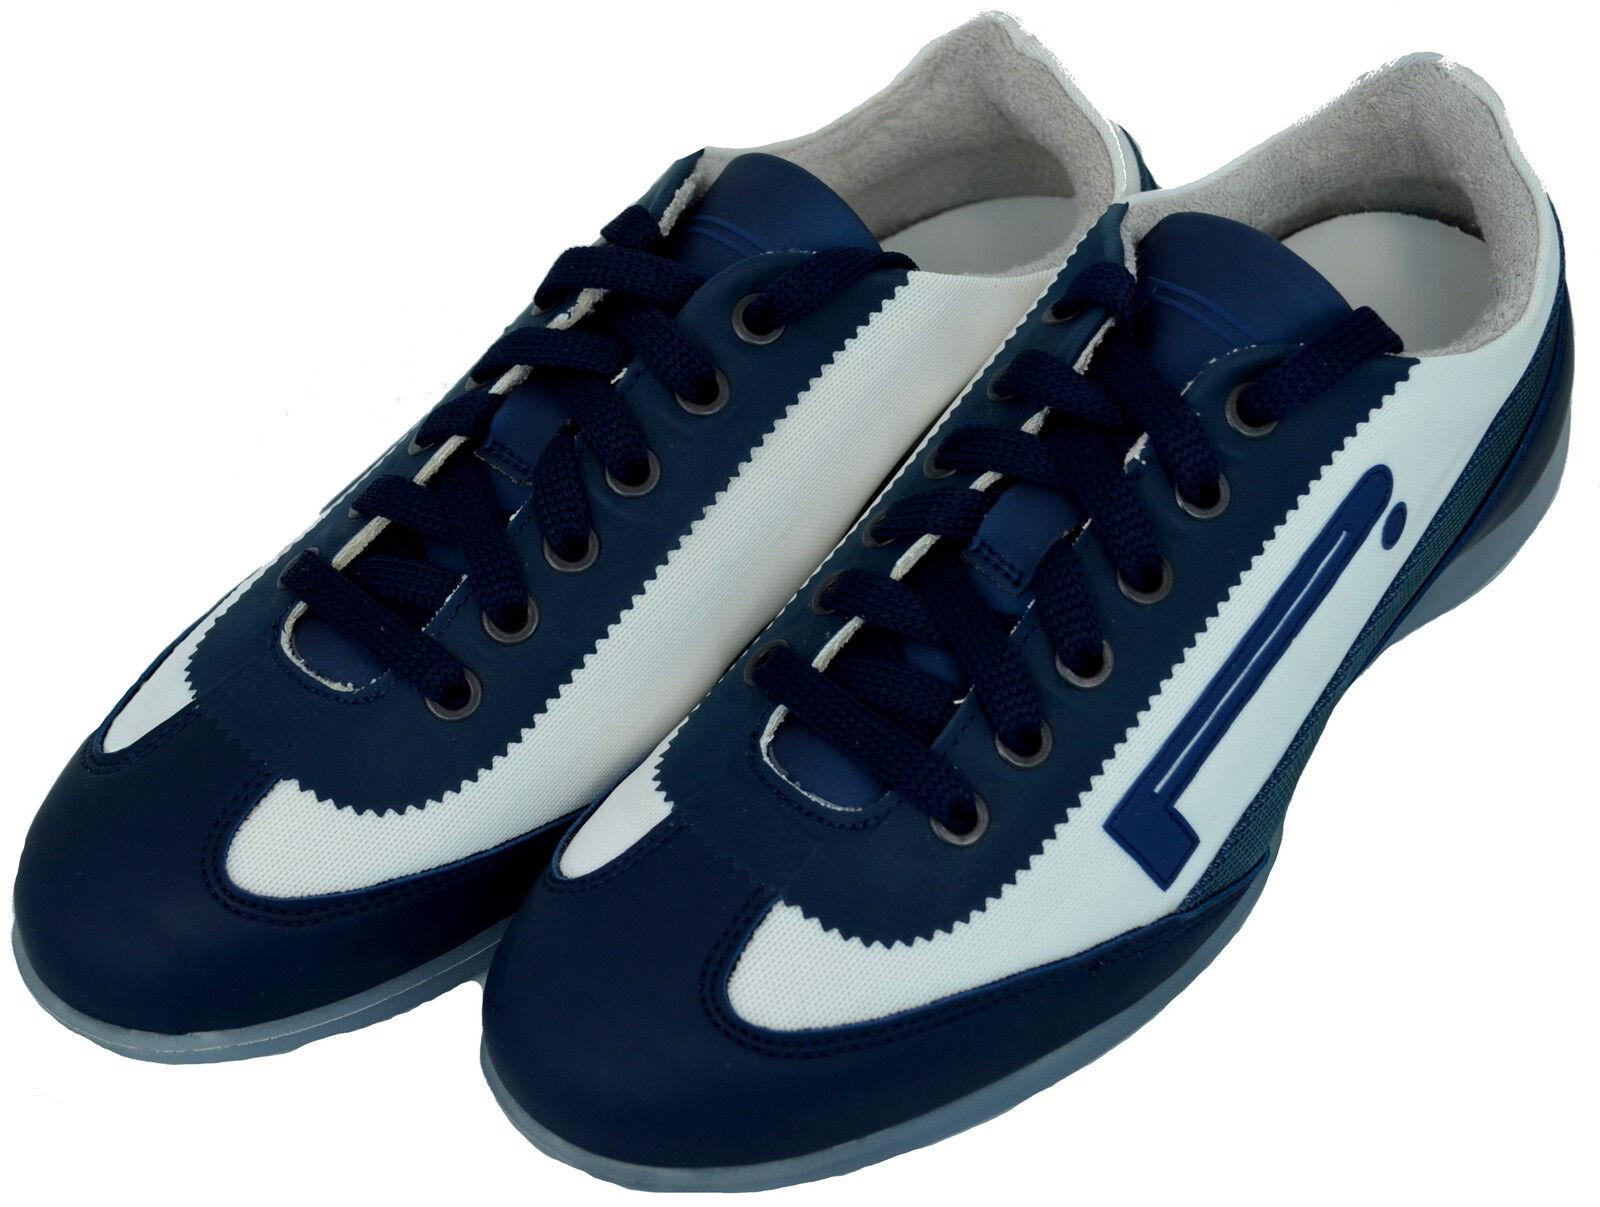 shoes men Sintetica Pirelli Sneakers Men New Rex-05 Sneakers-M Fabric Syn Navy